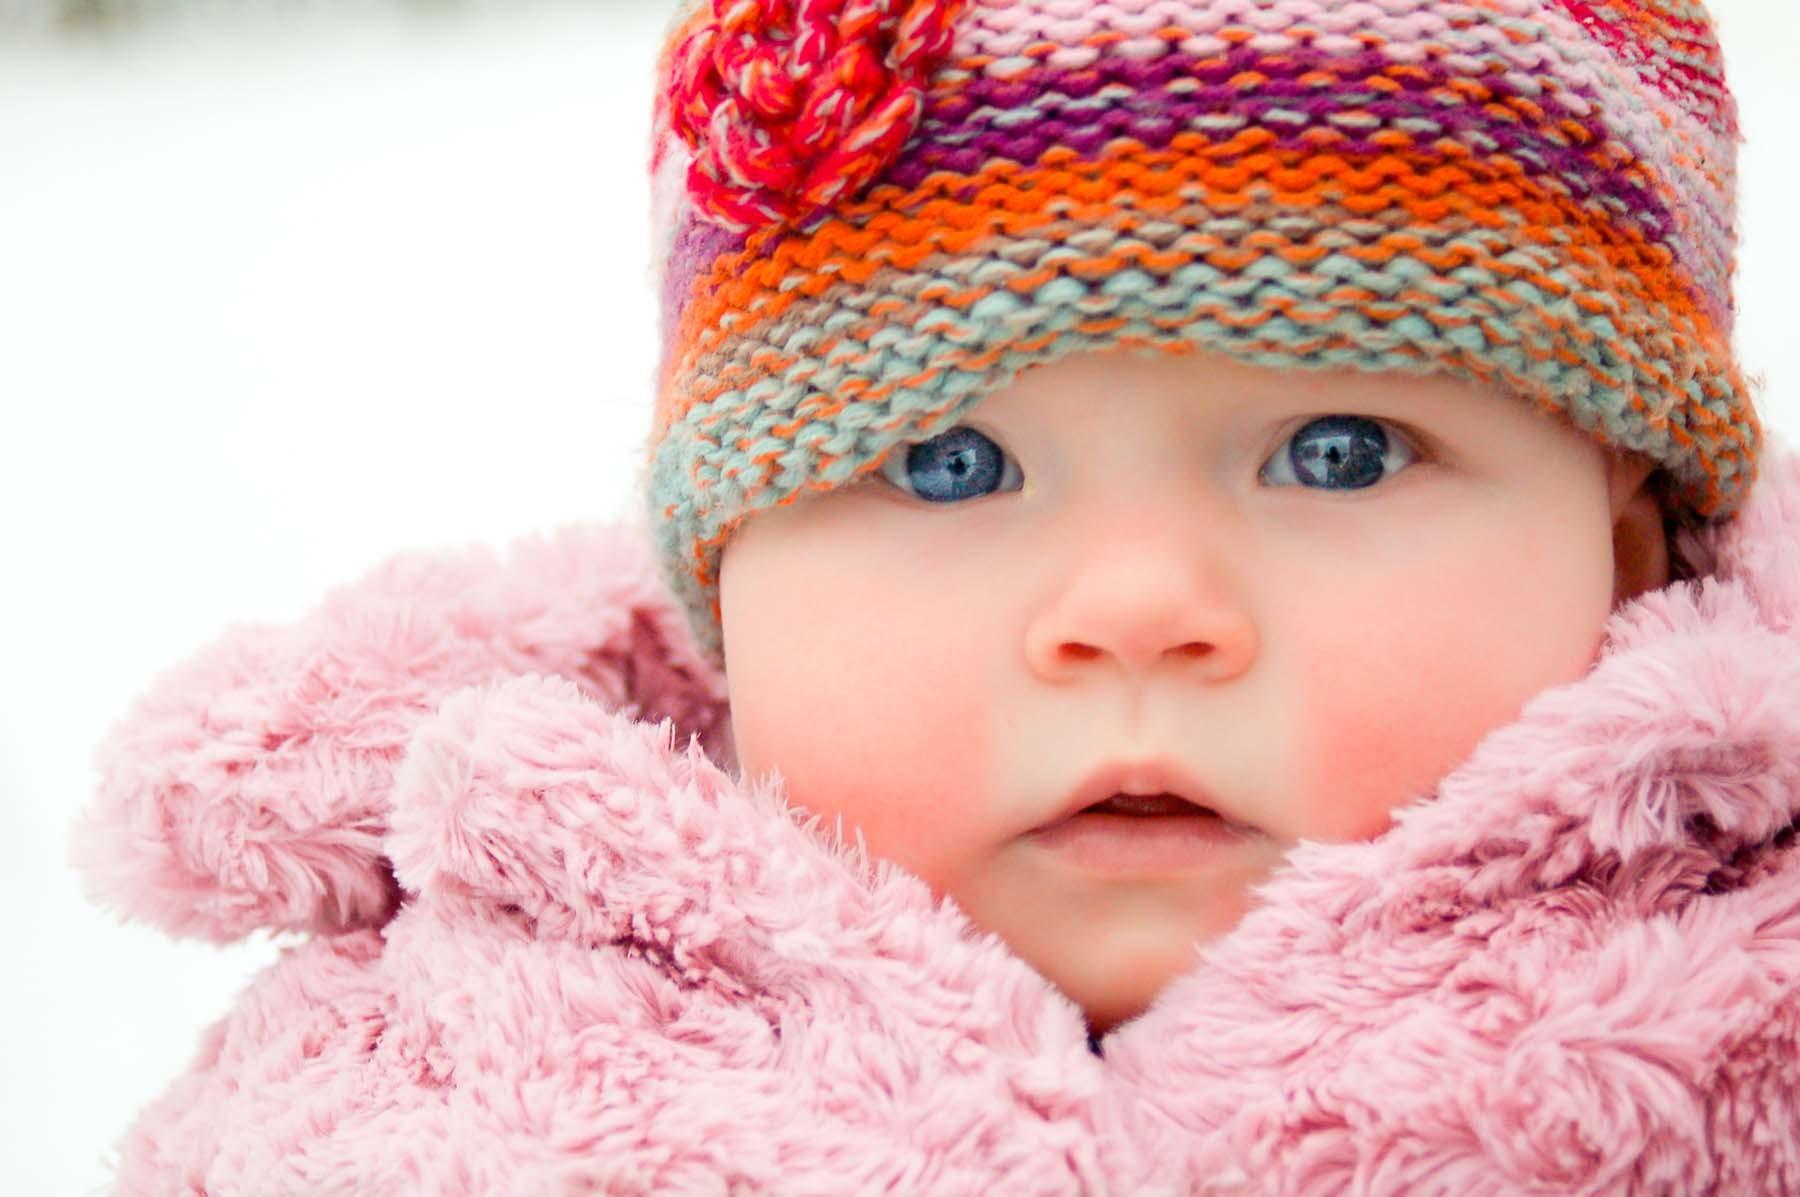 Newborn Baby Photographer in Sussex & Surrey, East Grinstead & Crawley (31)